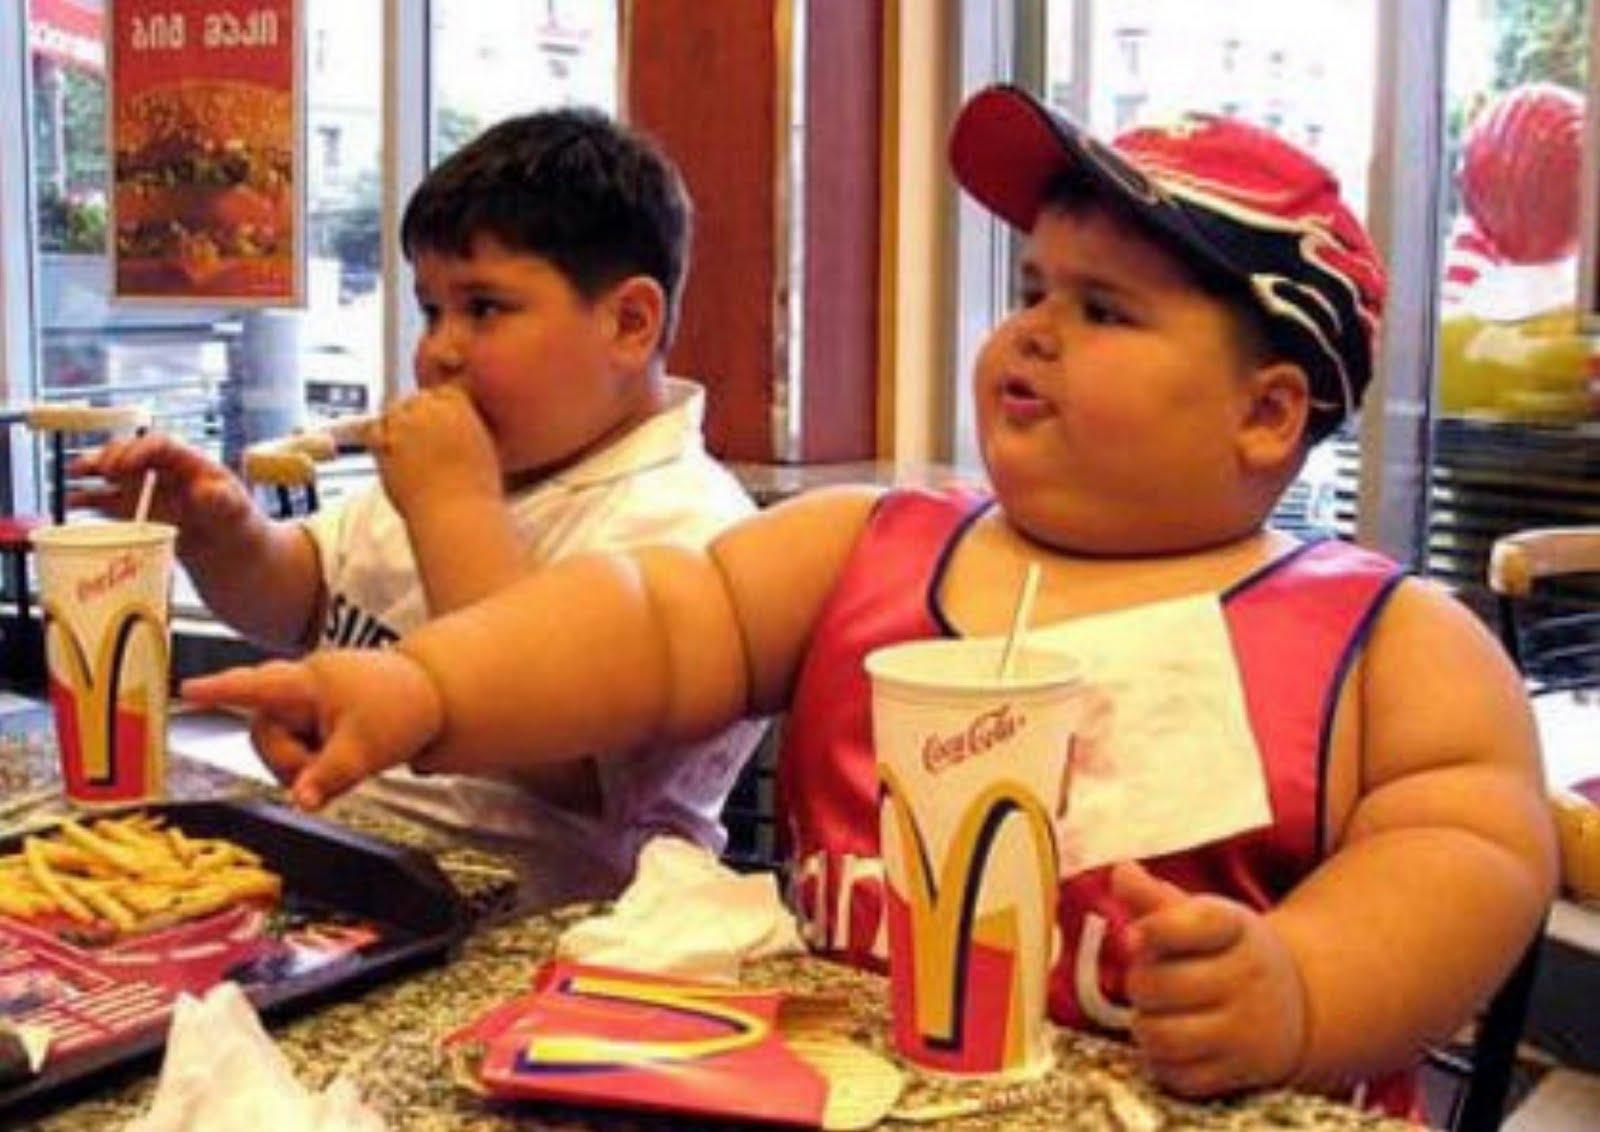 McDonald's fat children